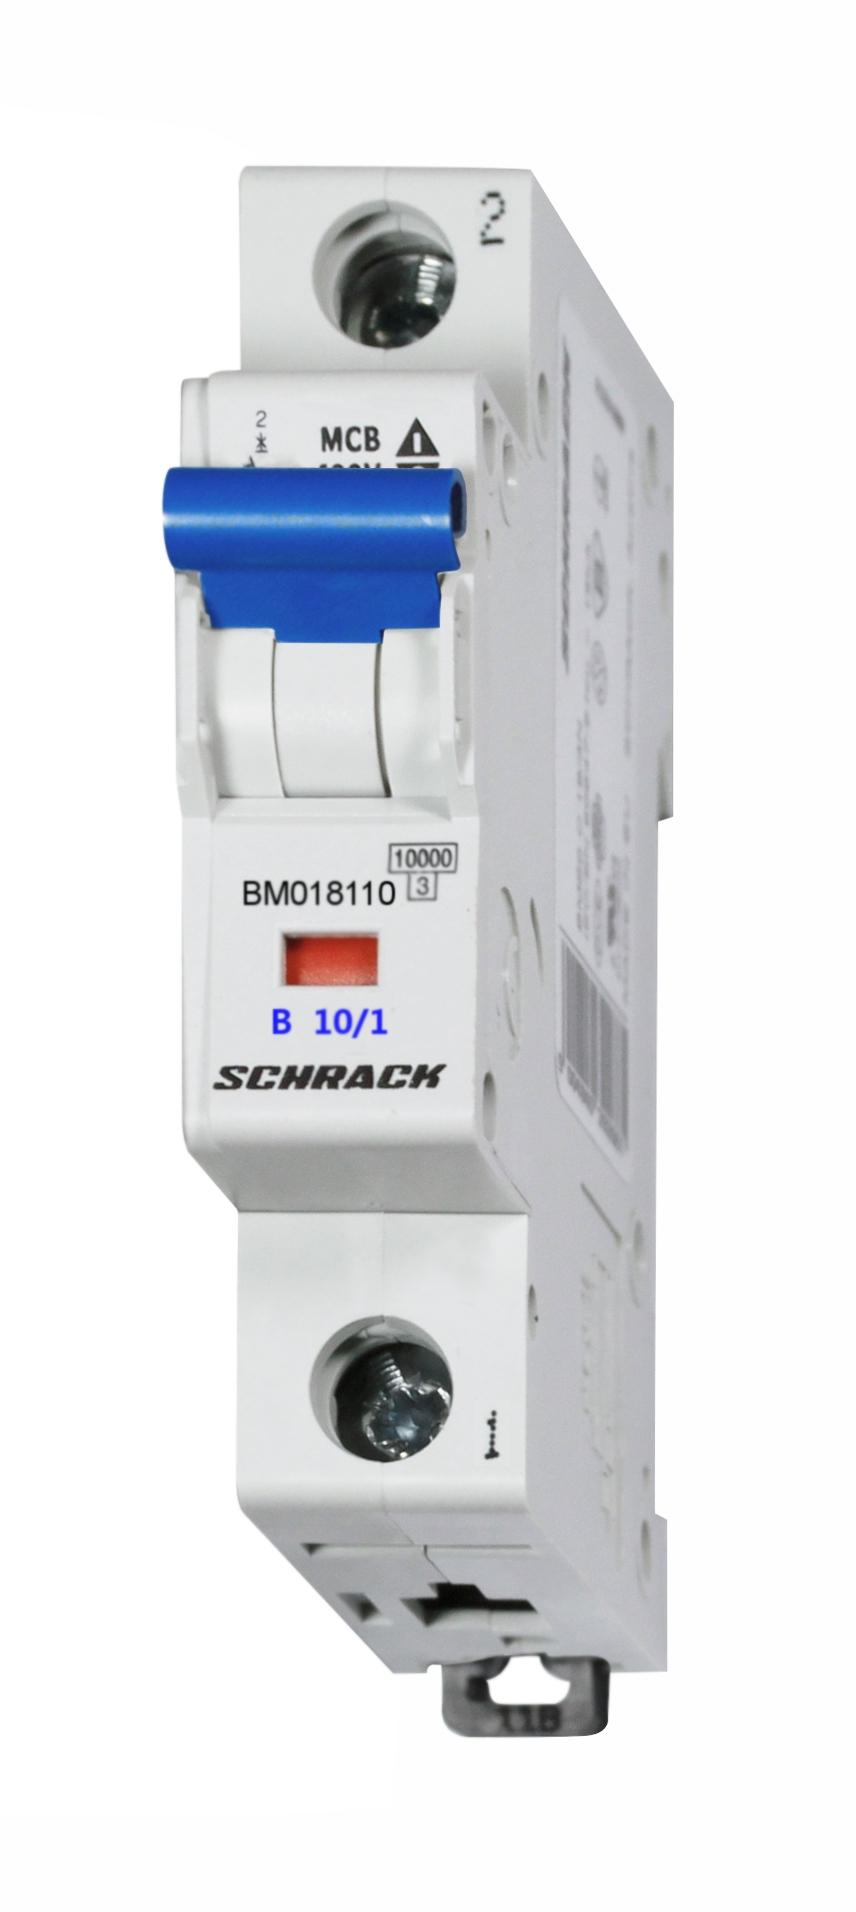 BM018110 - Schrack Technik